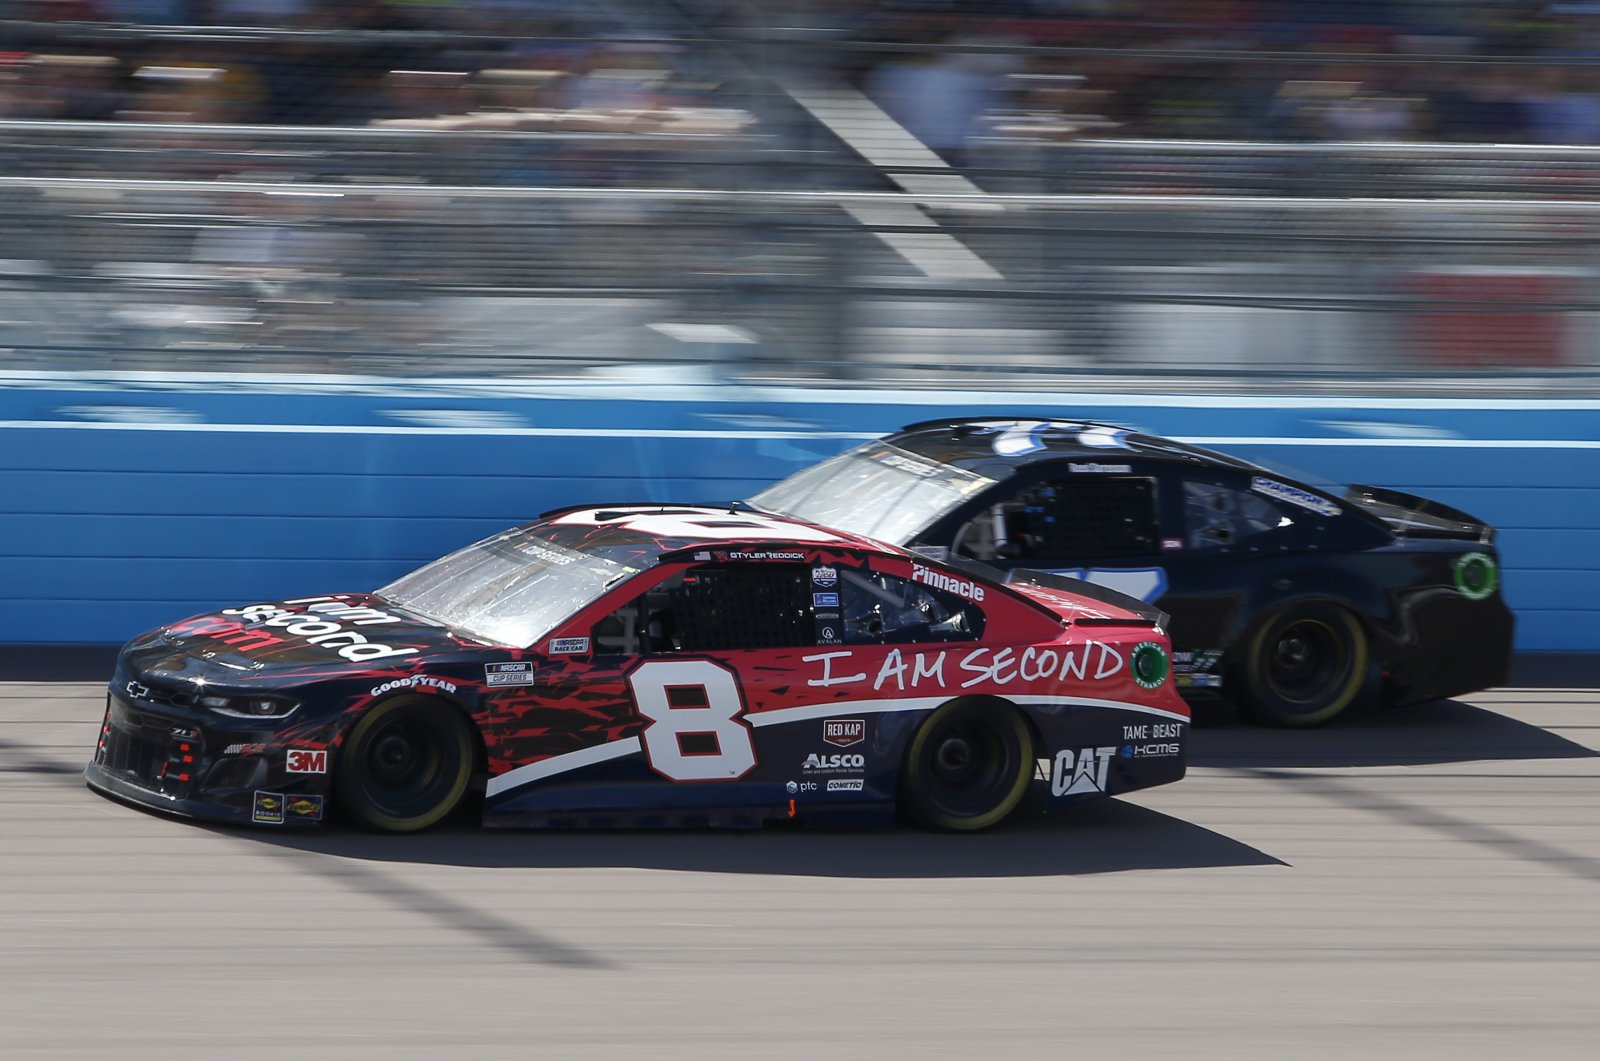 Tyler Reddick races past Reed Sorenson during a NASCAR race in Avondale, Arizona, March 8, 2020. (AP Photo)